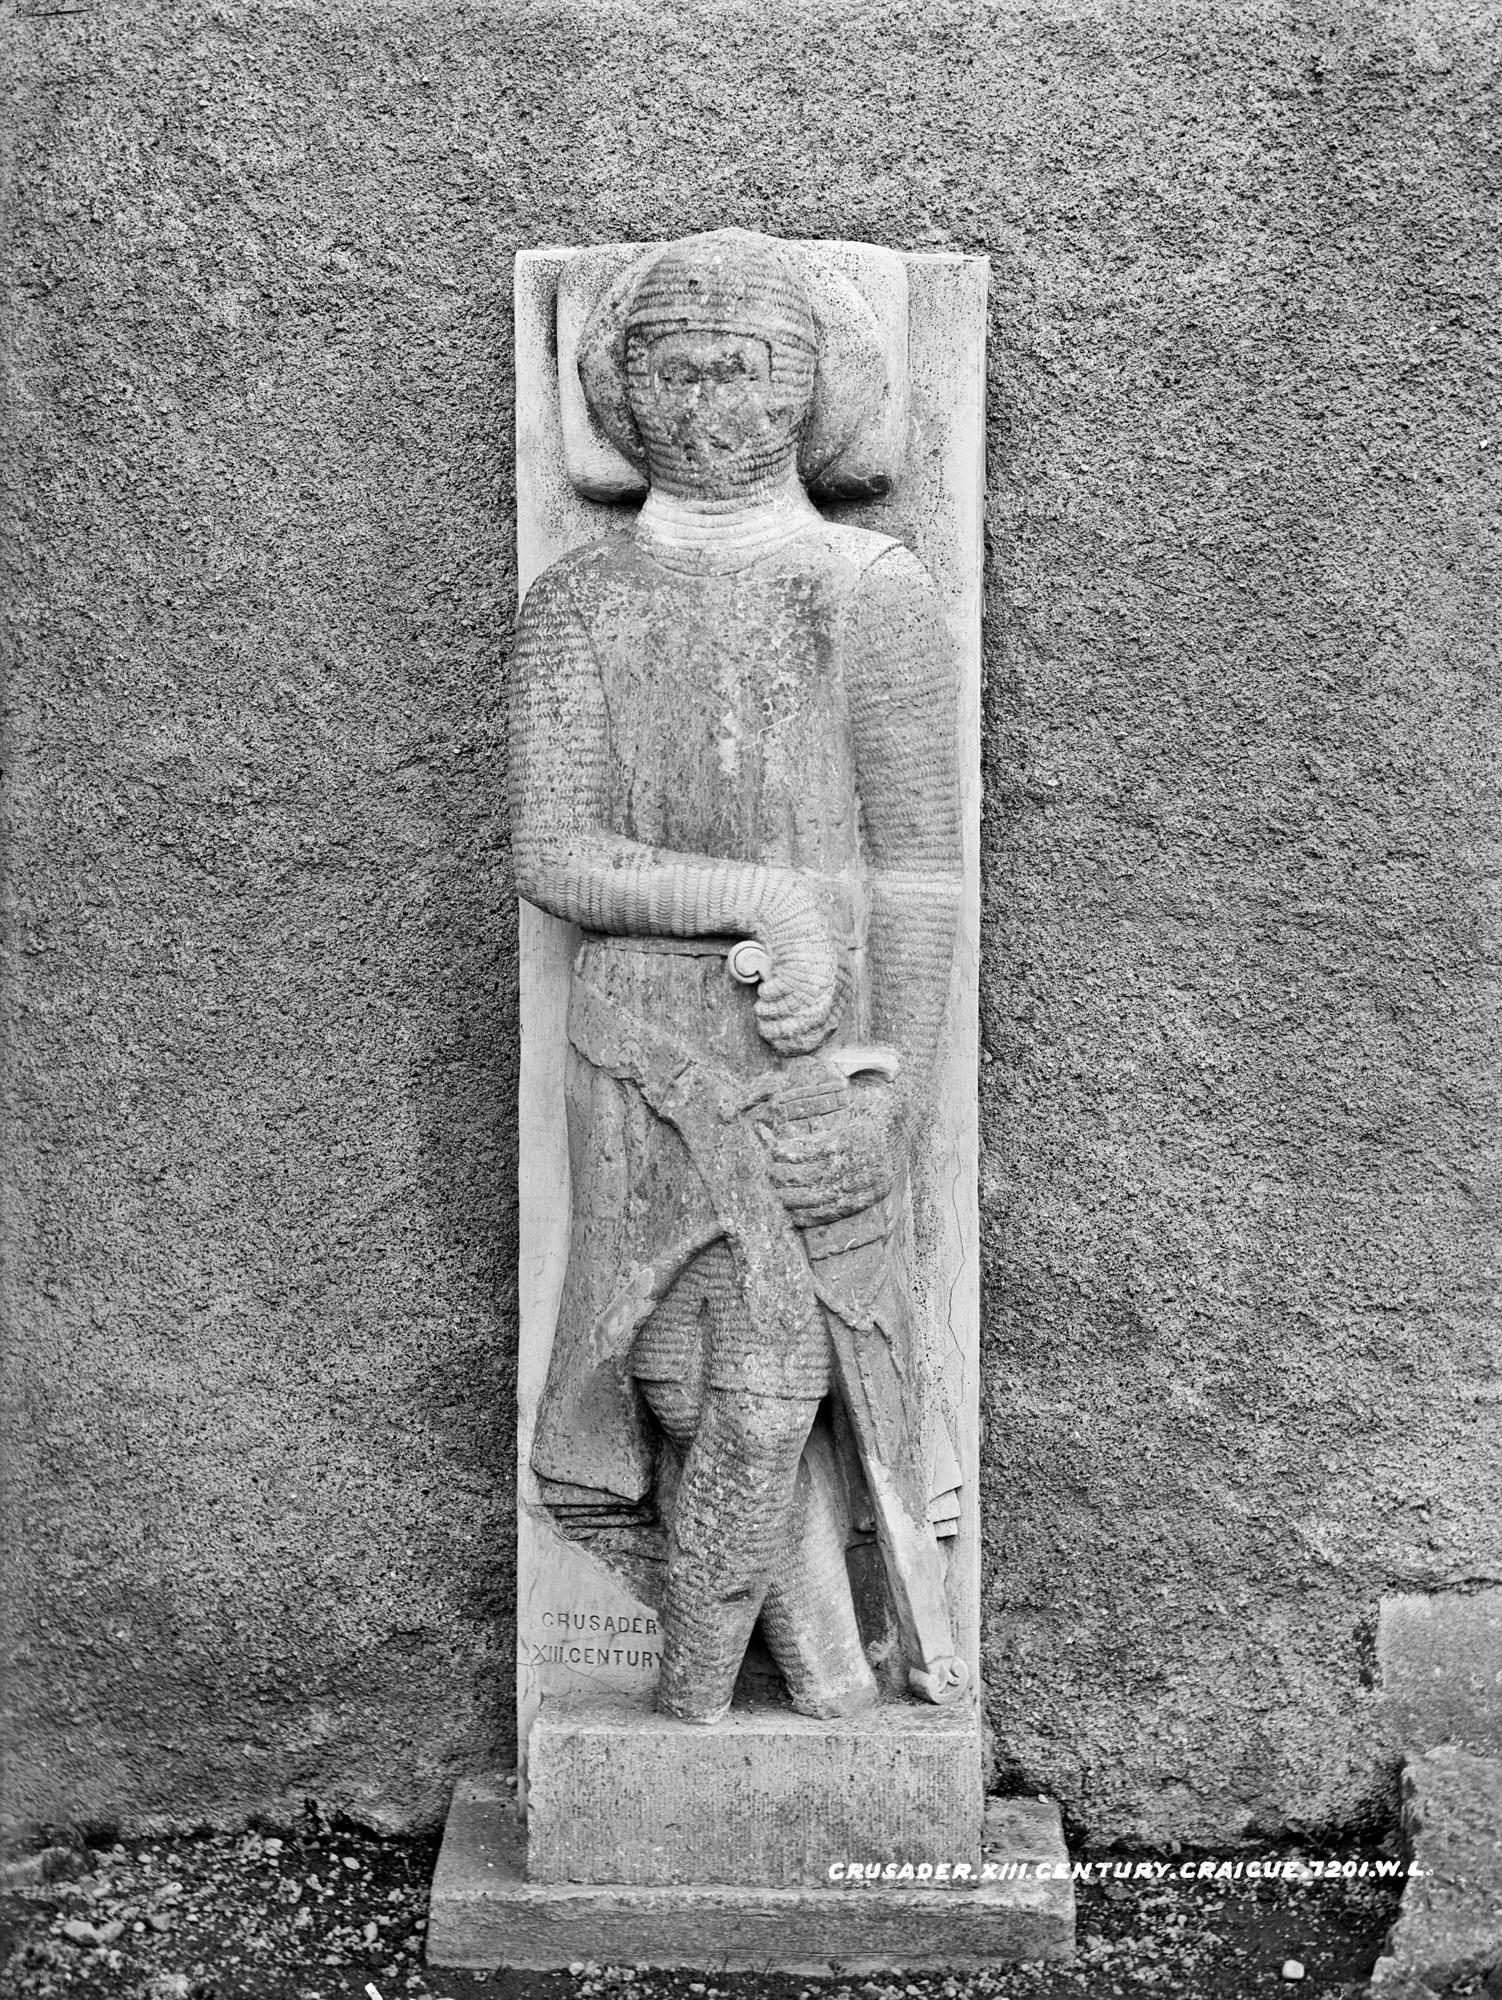 Crusader, XIII Century, Graiguenamanagh, Co. Kilkenny